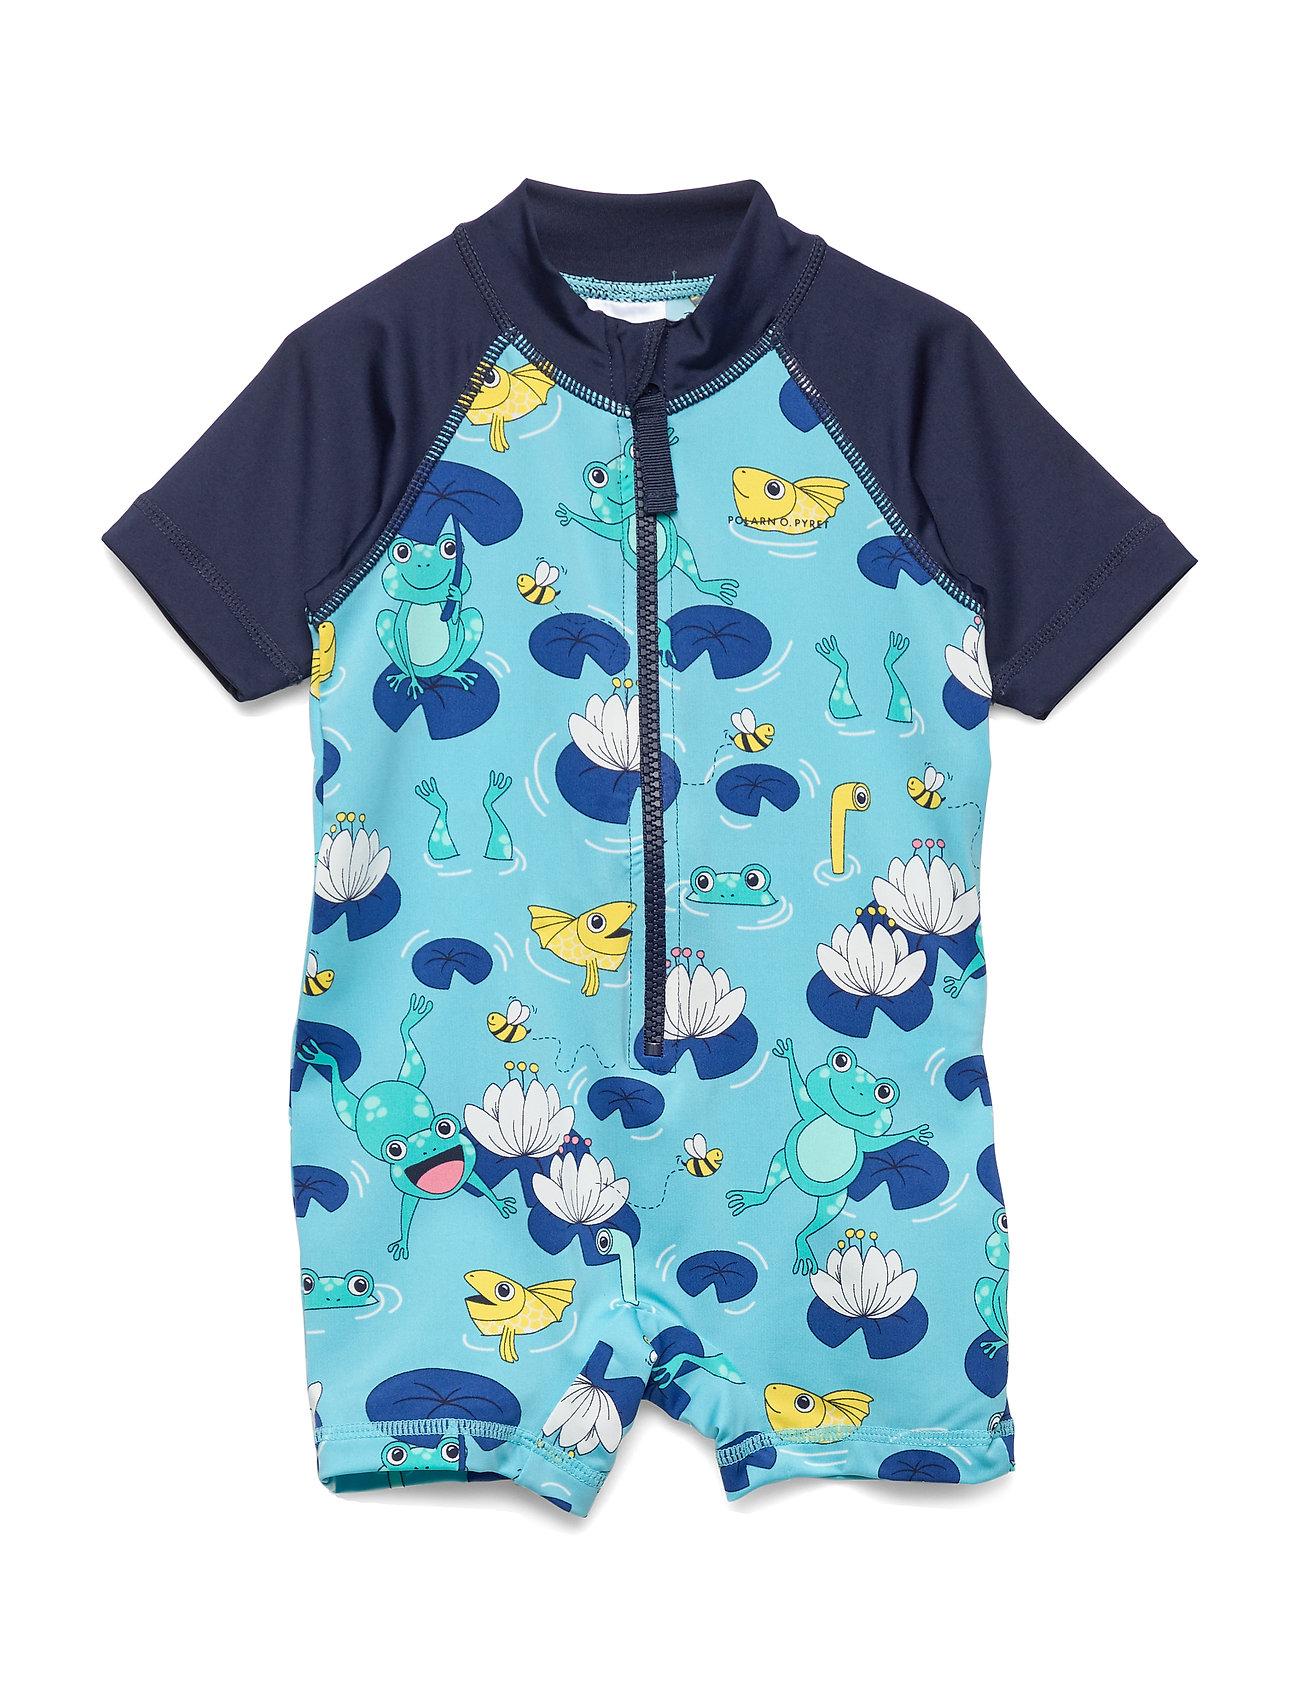 Polarn O. Pyret Swimsuit Short Baby - DARK SAPPHIRE